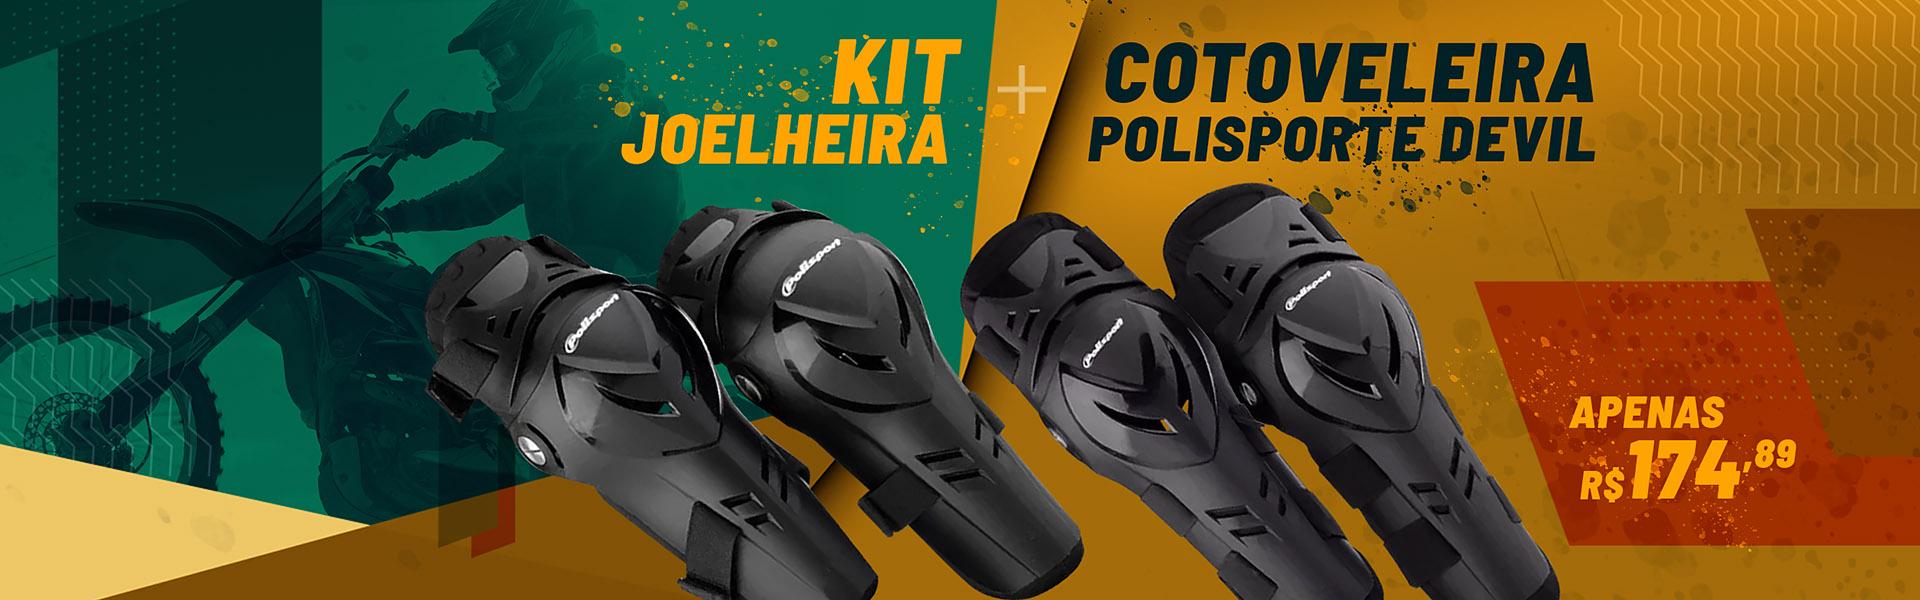 Kit joelheira + Cotoveleira Polisporte Devil